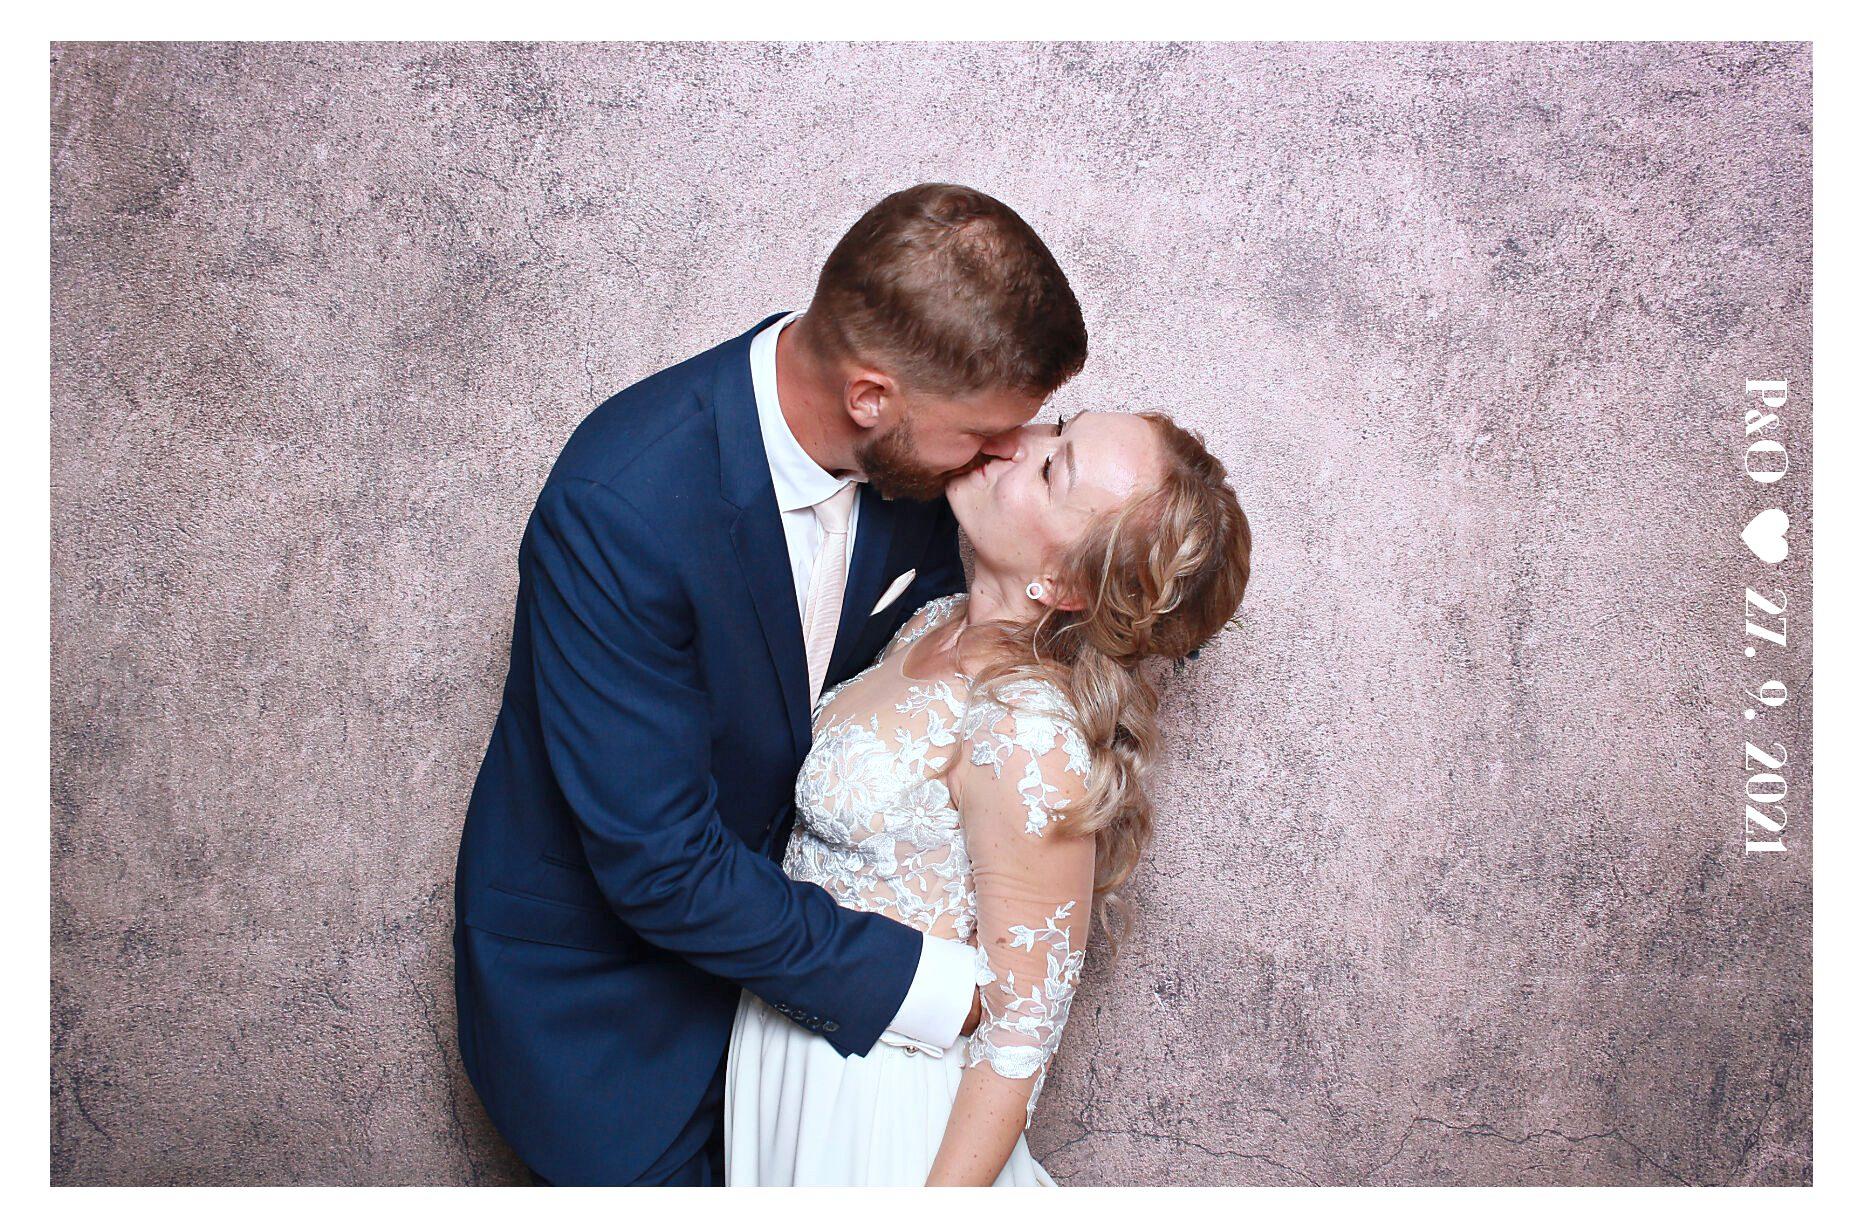 fotokoutek-svatba-po-27-9-2021-755270